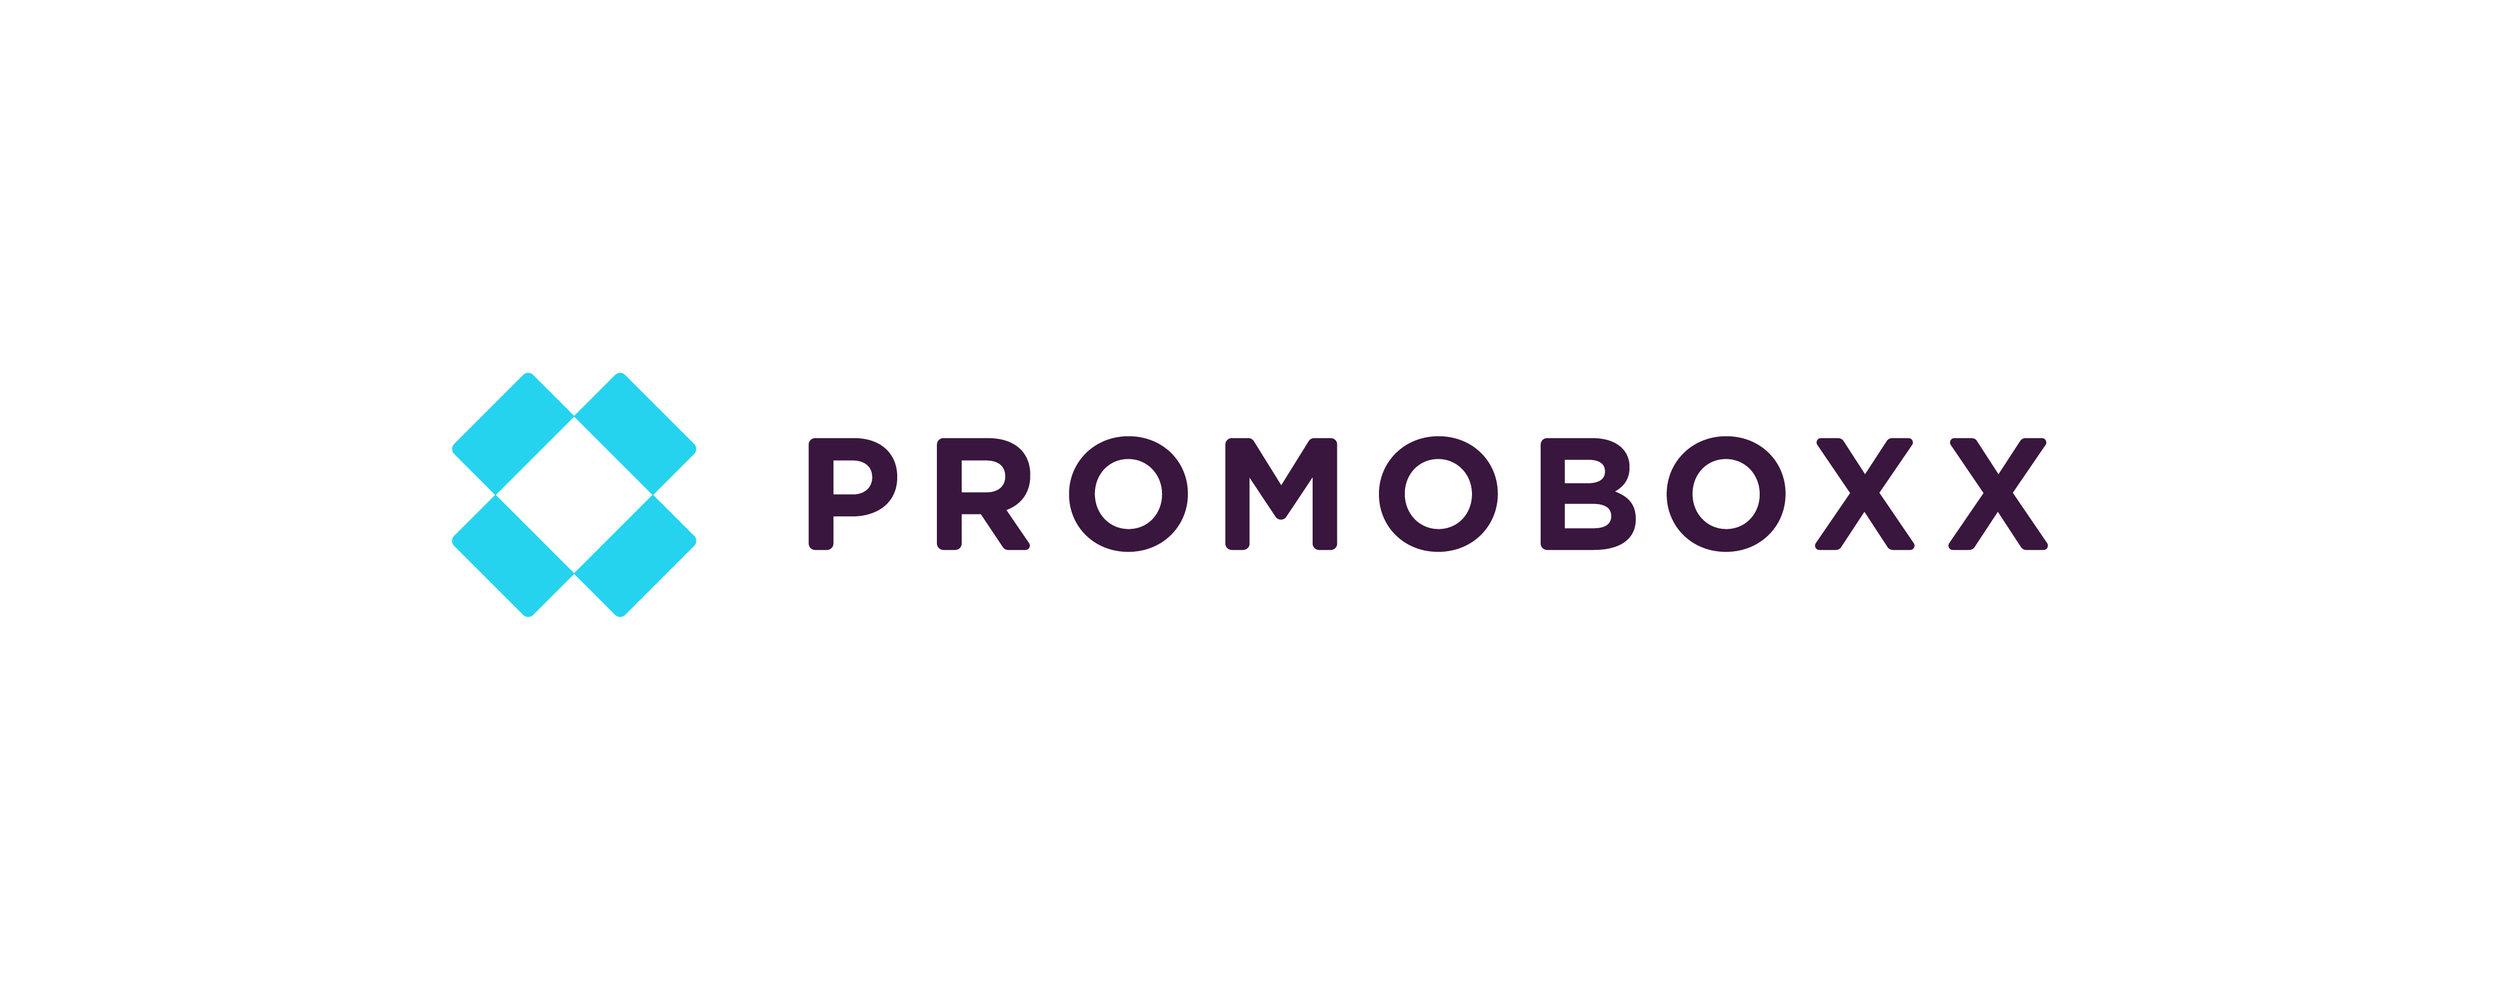 pbxx-logo.jpg